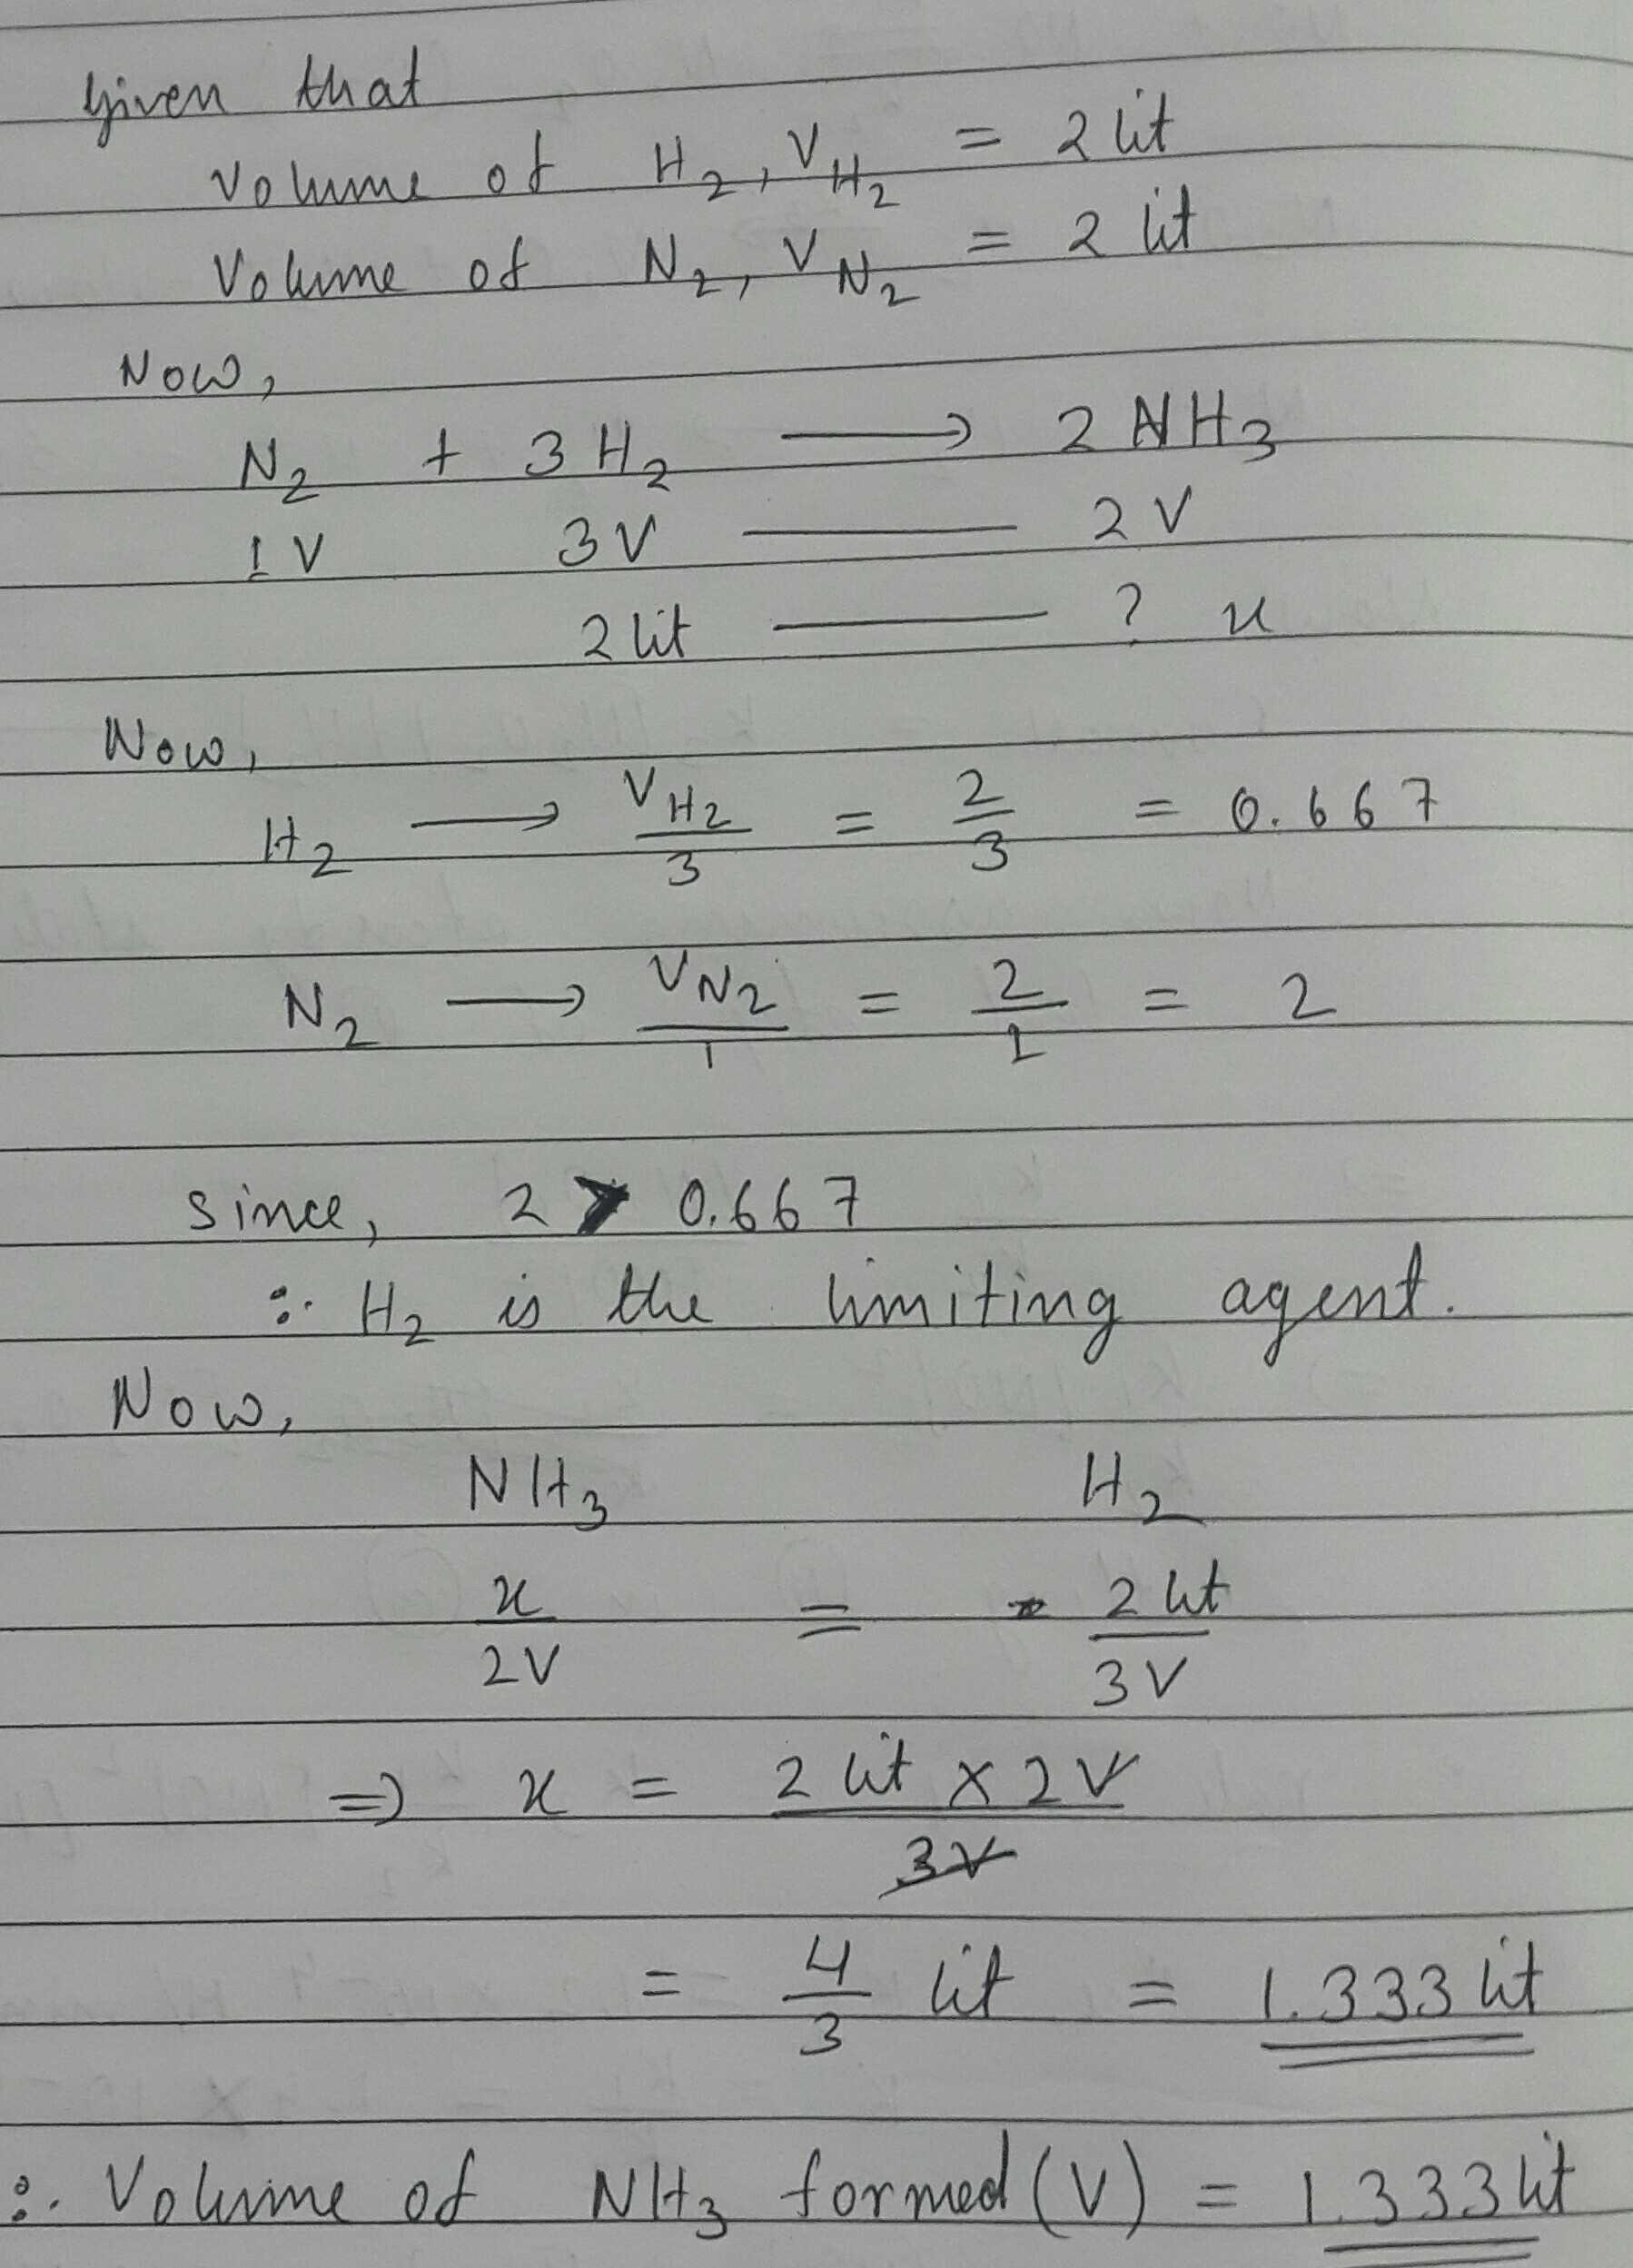 If 2 L of N2 is mixed with 2L of H2 at a toppr.com